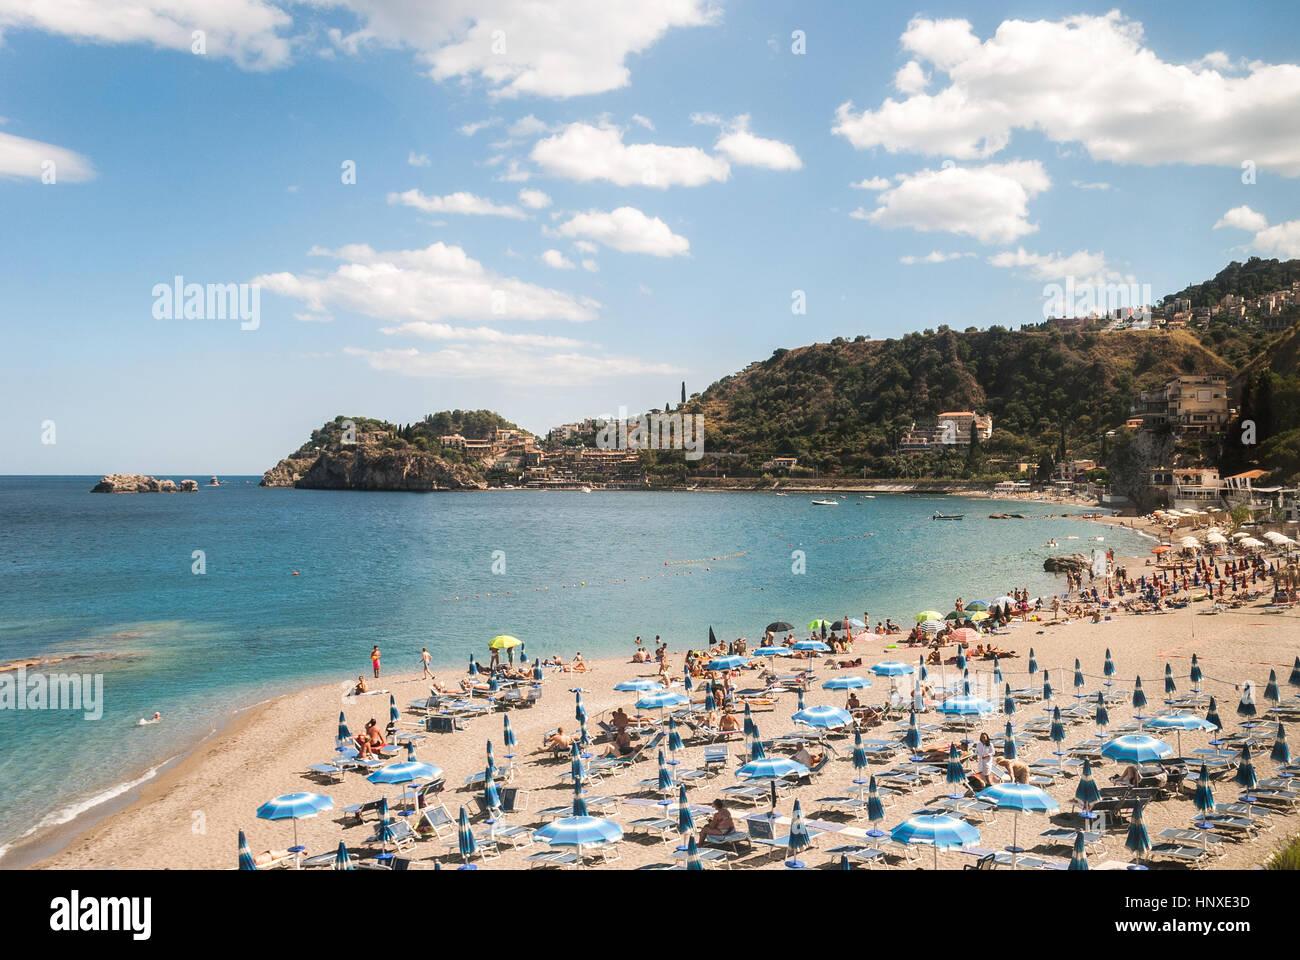 Strand in der Nähe von Taormina (Sizilien) im Sommer Stockbild